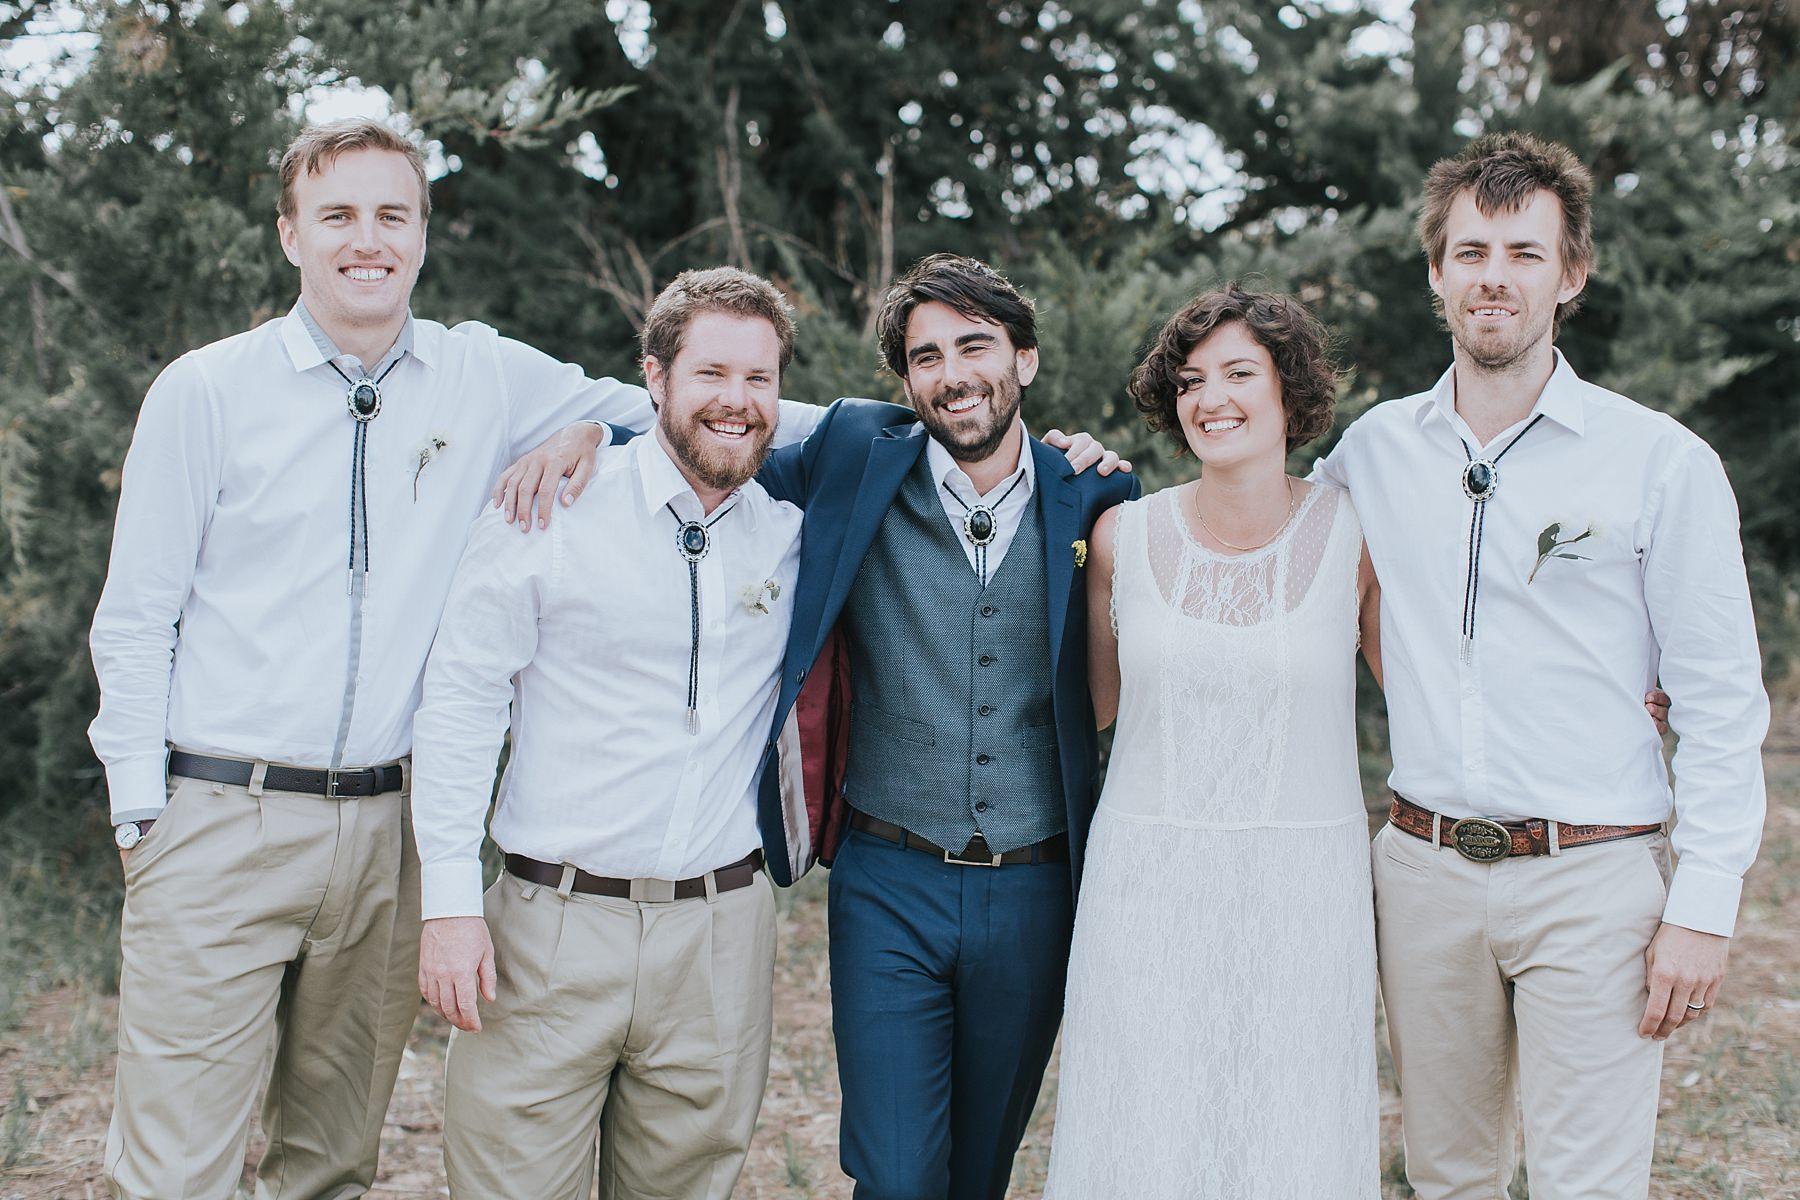 jonathan david photography with the groomsmen